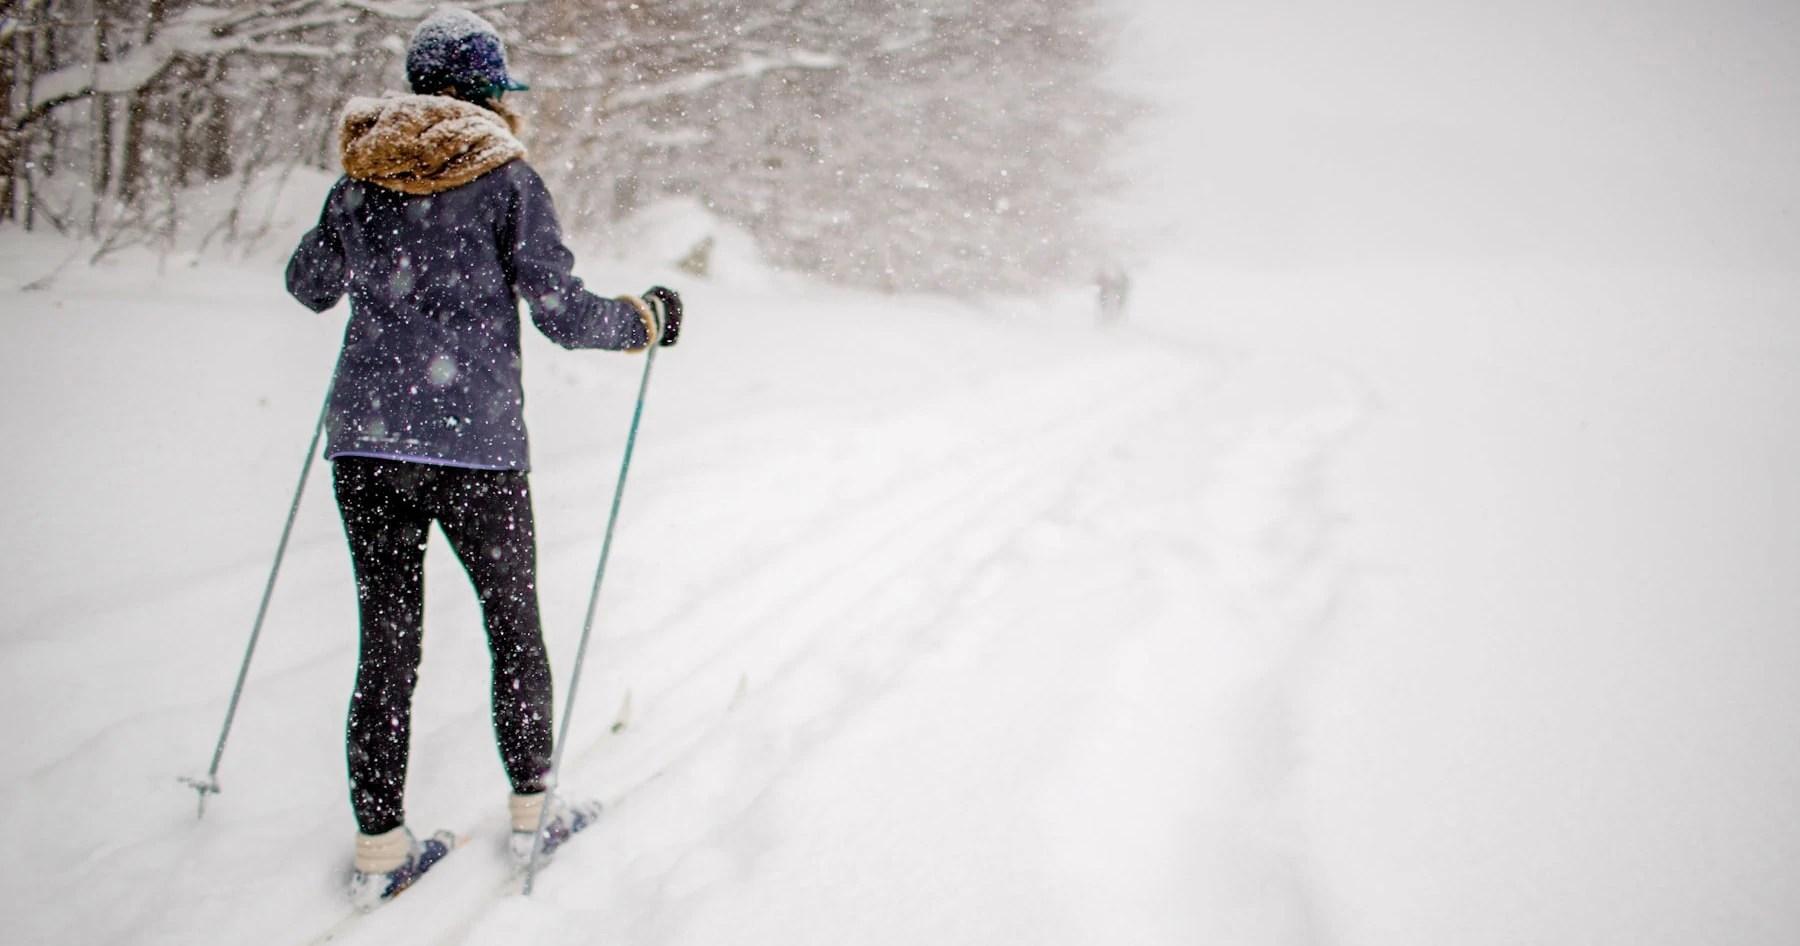 Winter Northern Michigan Activities